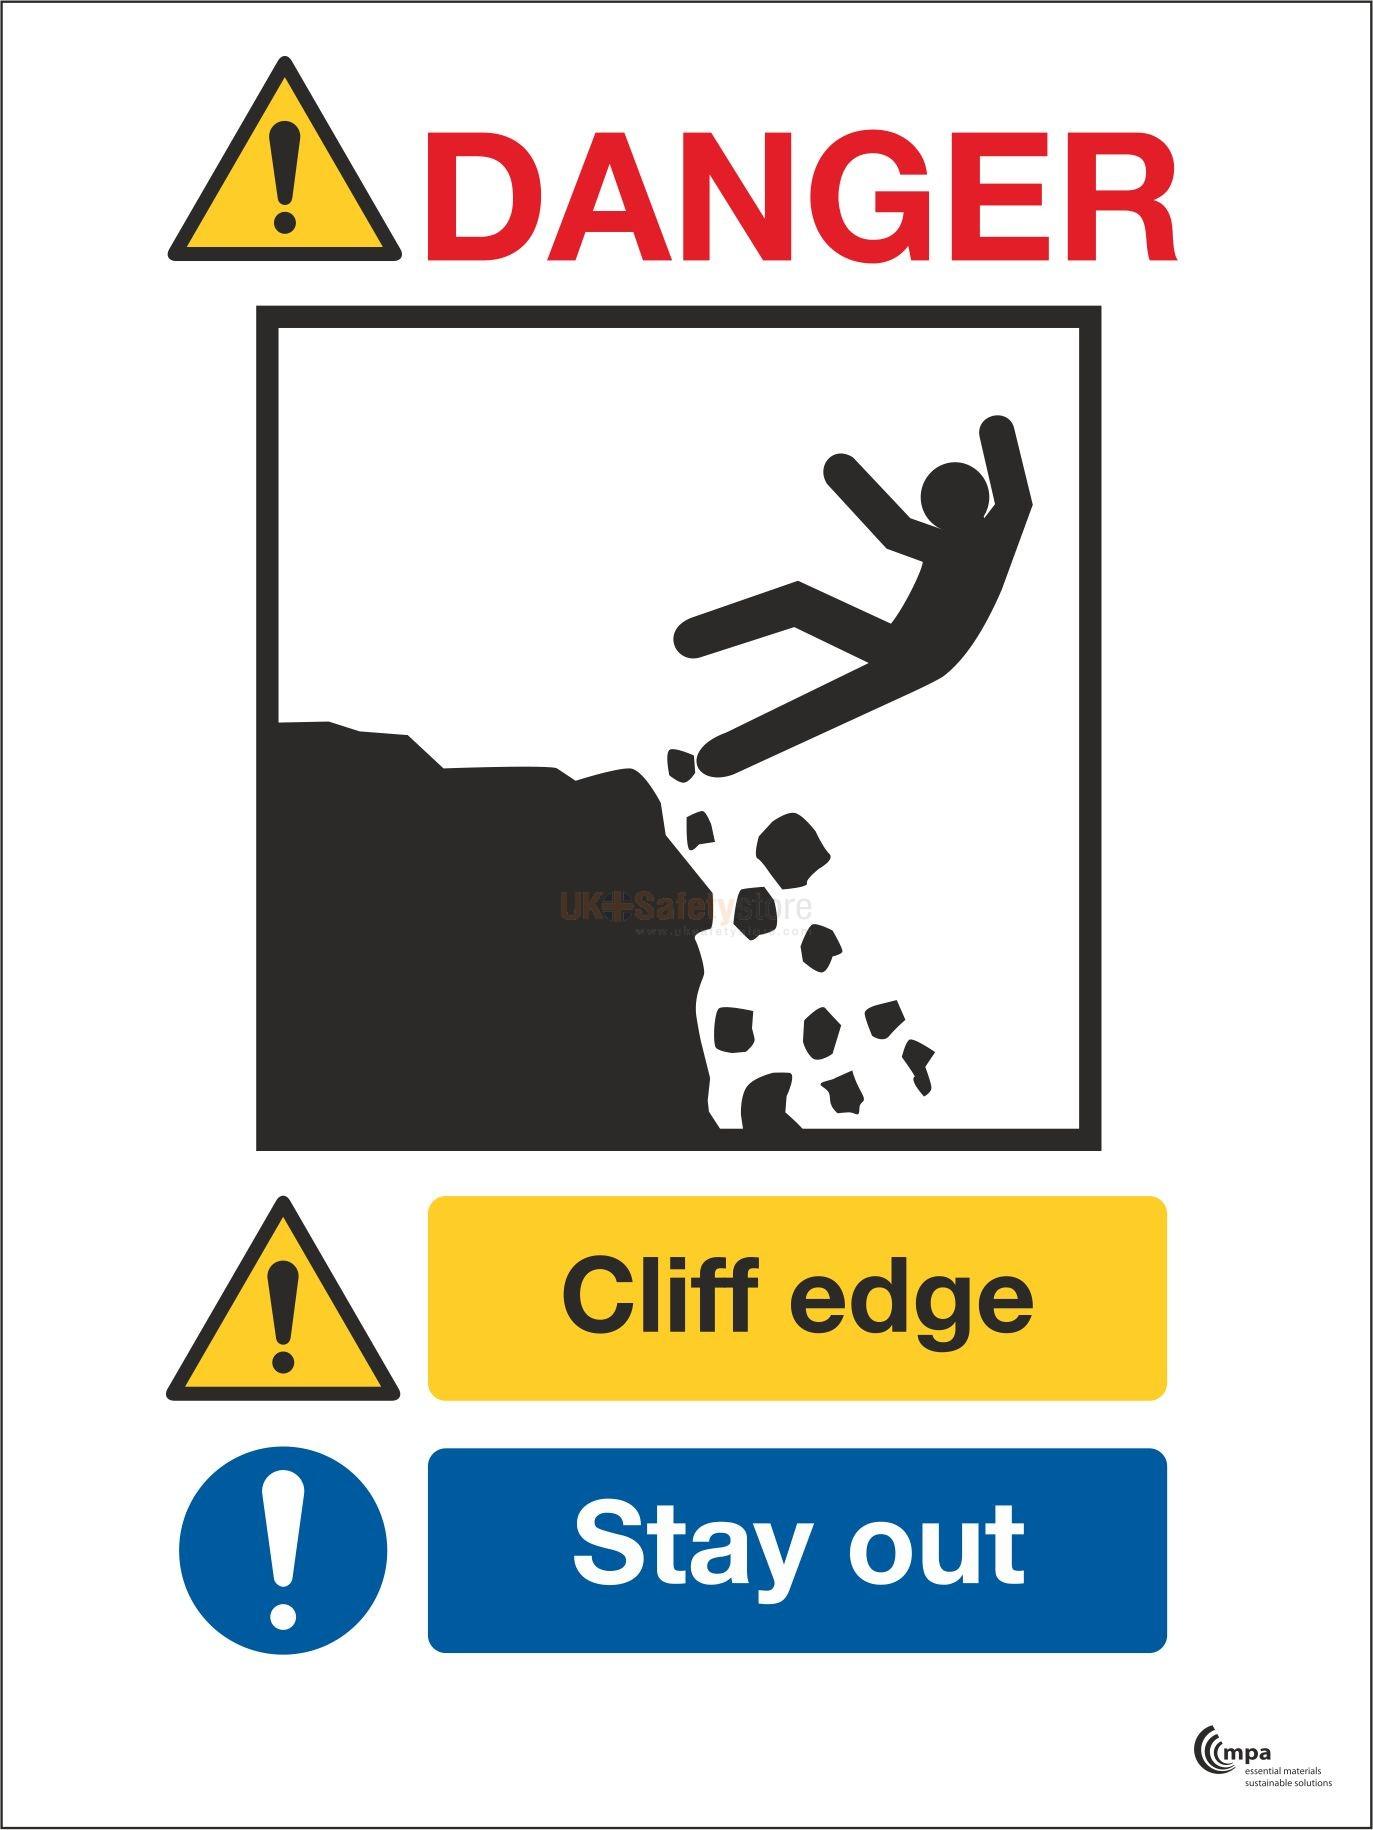 Cliff edge sign photo